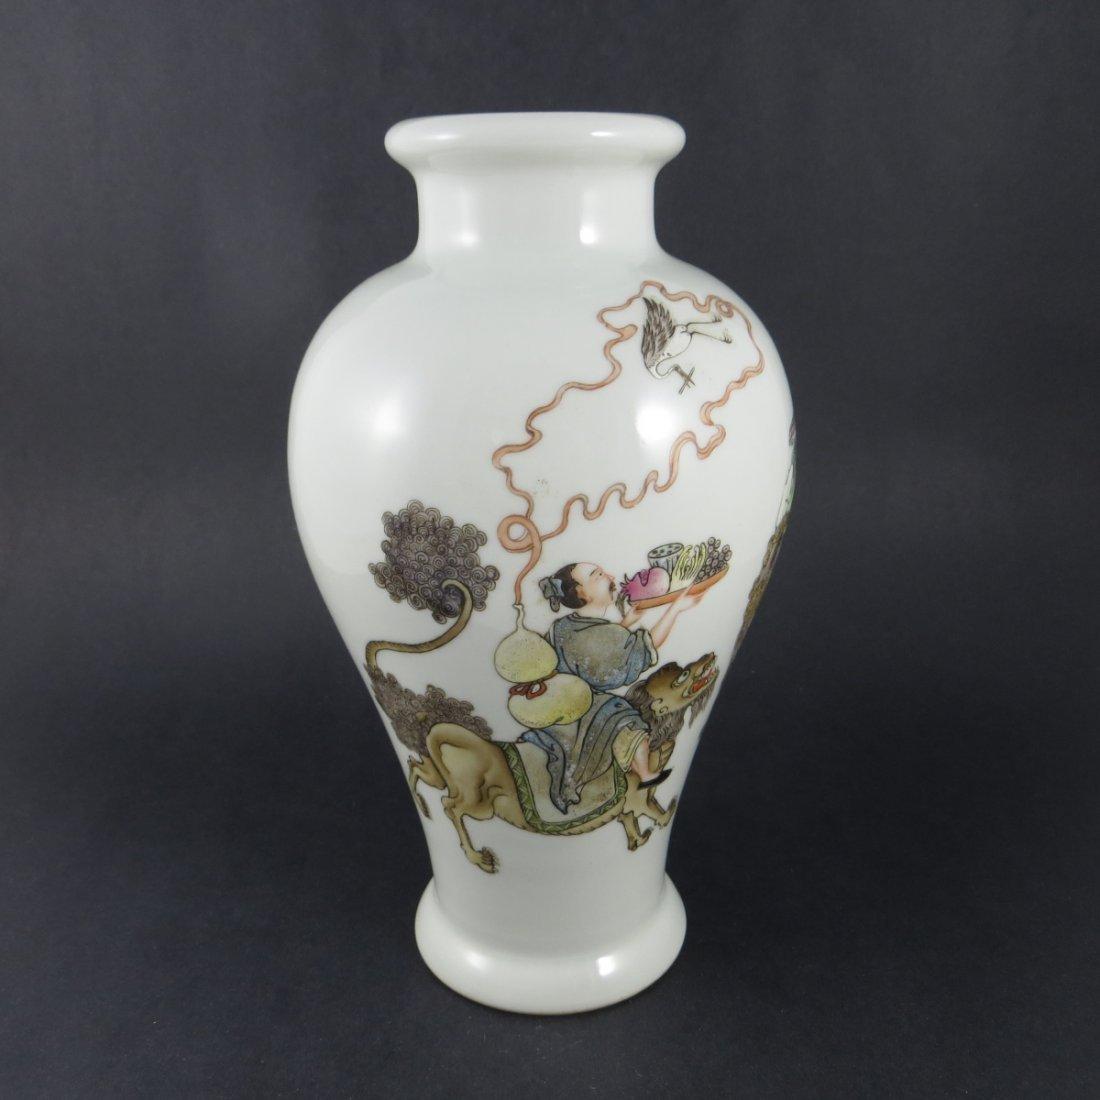 Chinese Qing Dynasty Famille Rose Porcelain Vase - 2